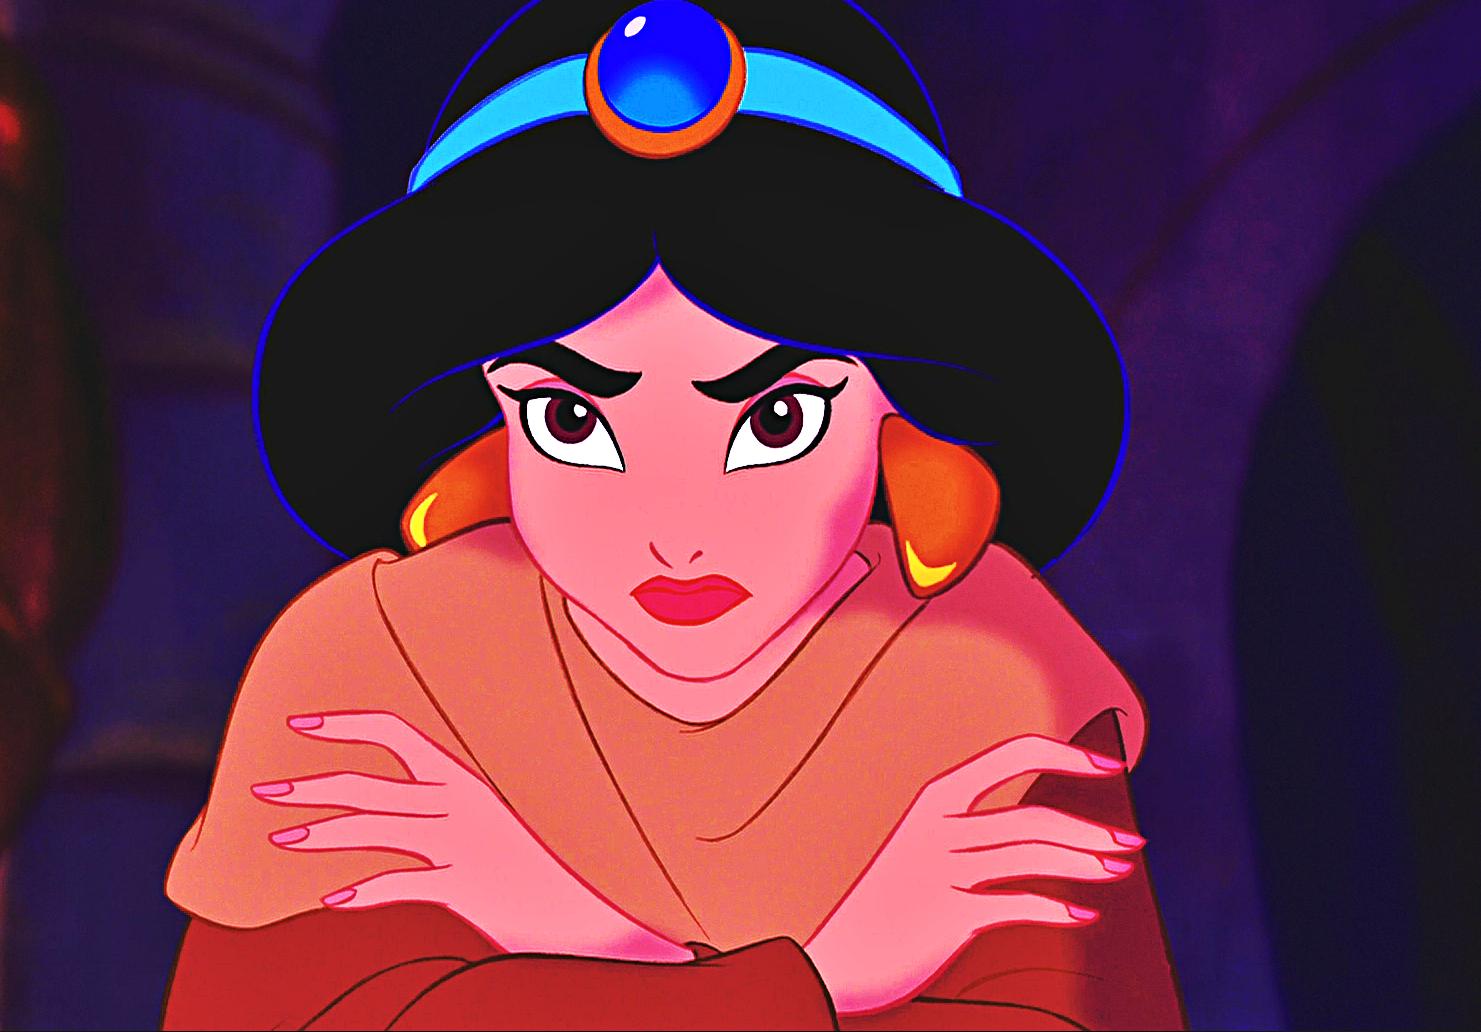 Walt डिज़्नी - Princess चमेली